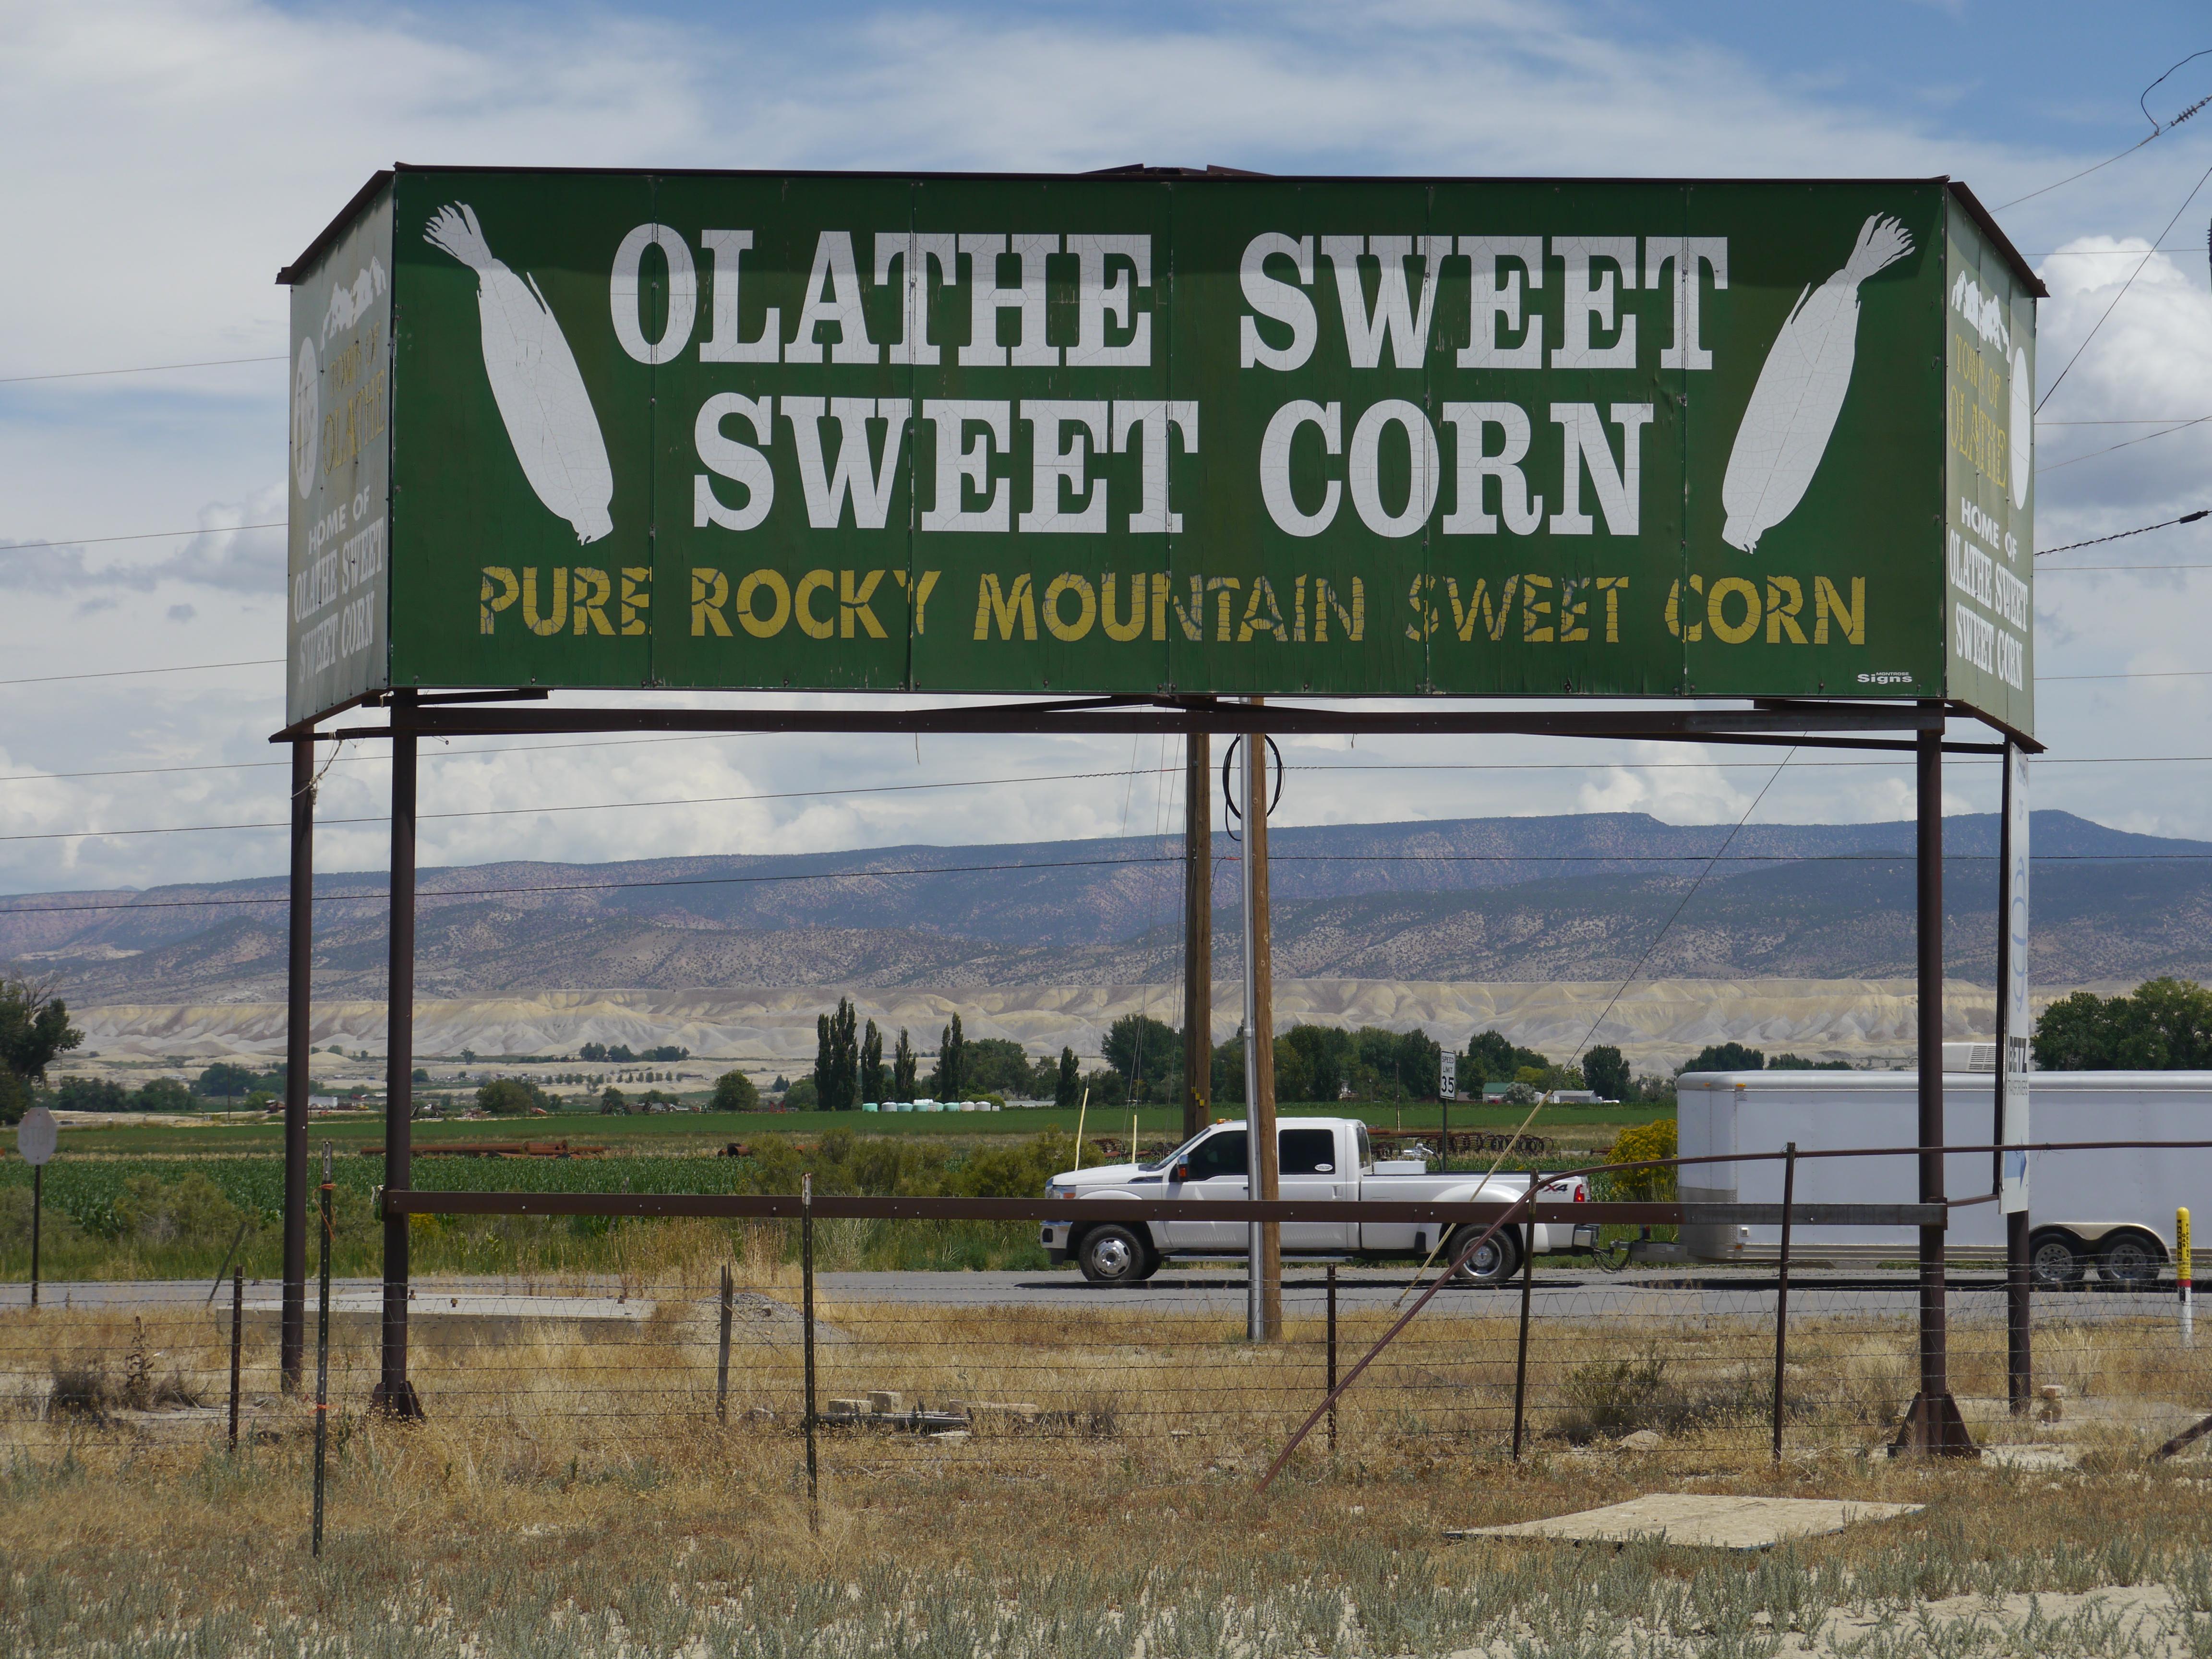 A billboard for David Harold's family farm in Colorado, Olathe Sweet Sweet Corn.